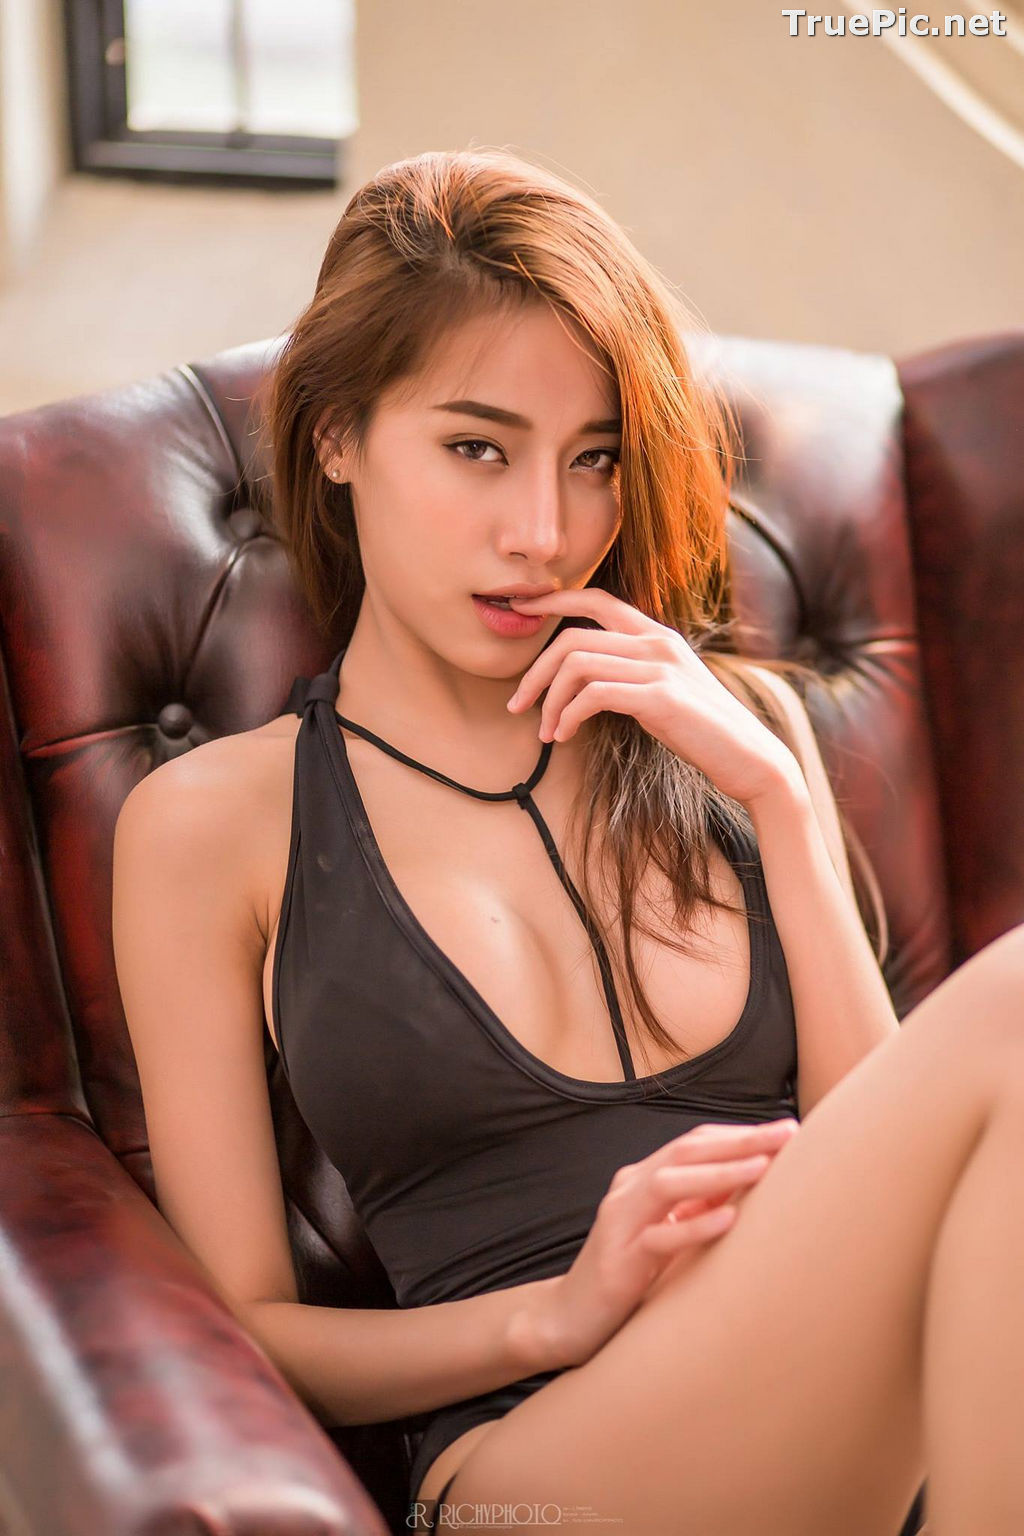 Image Thailand Model - Pichana Yoosuk - Black One Piece Swimsuit - TruePic.net - Picture-3